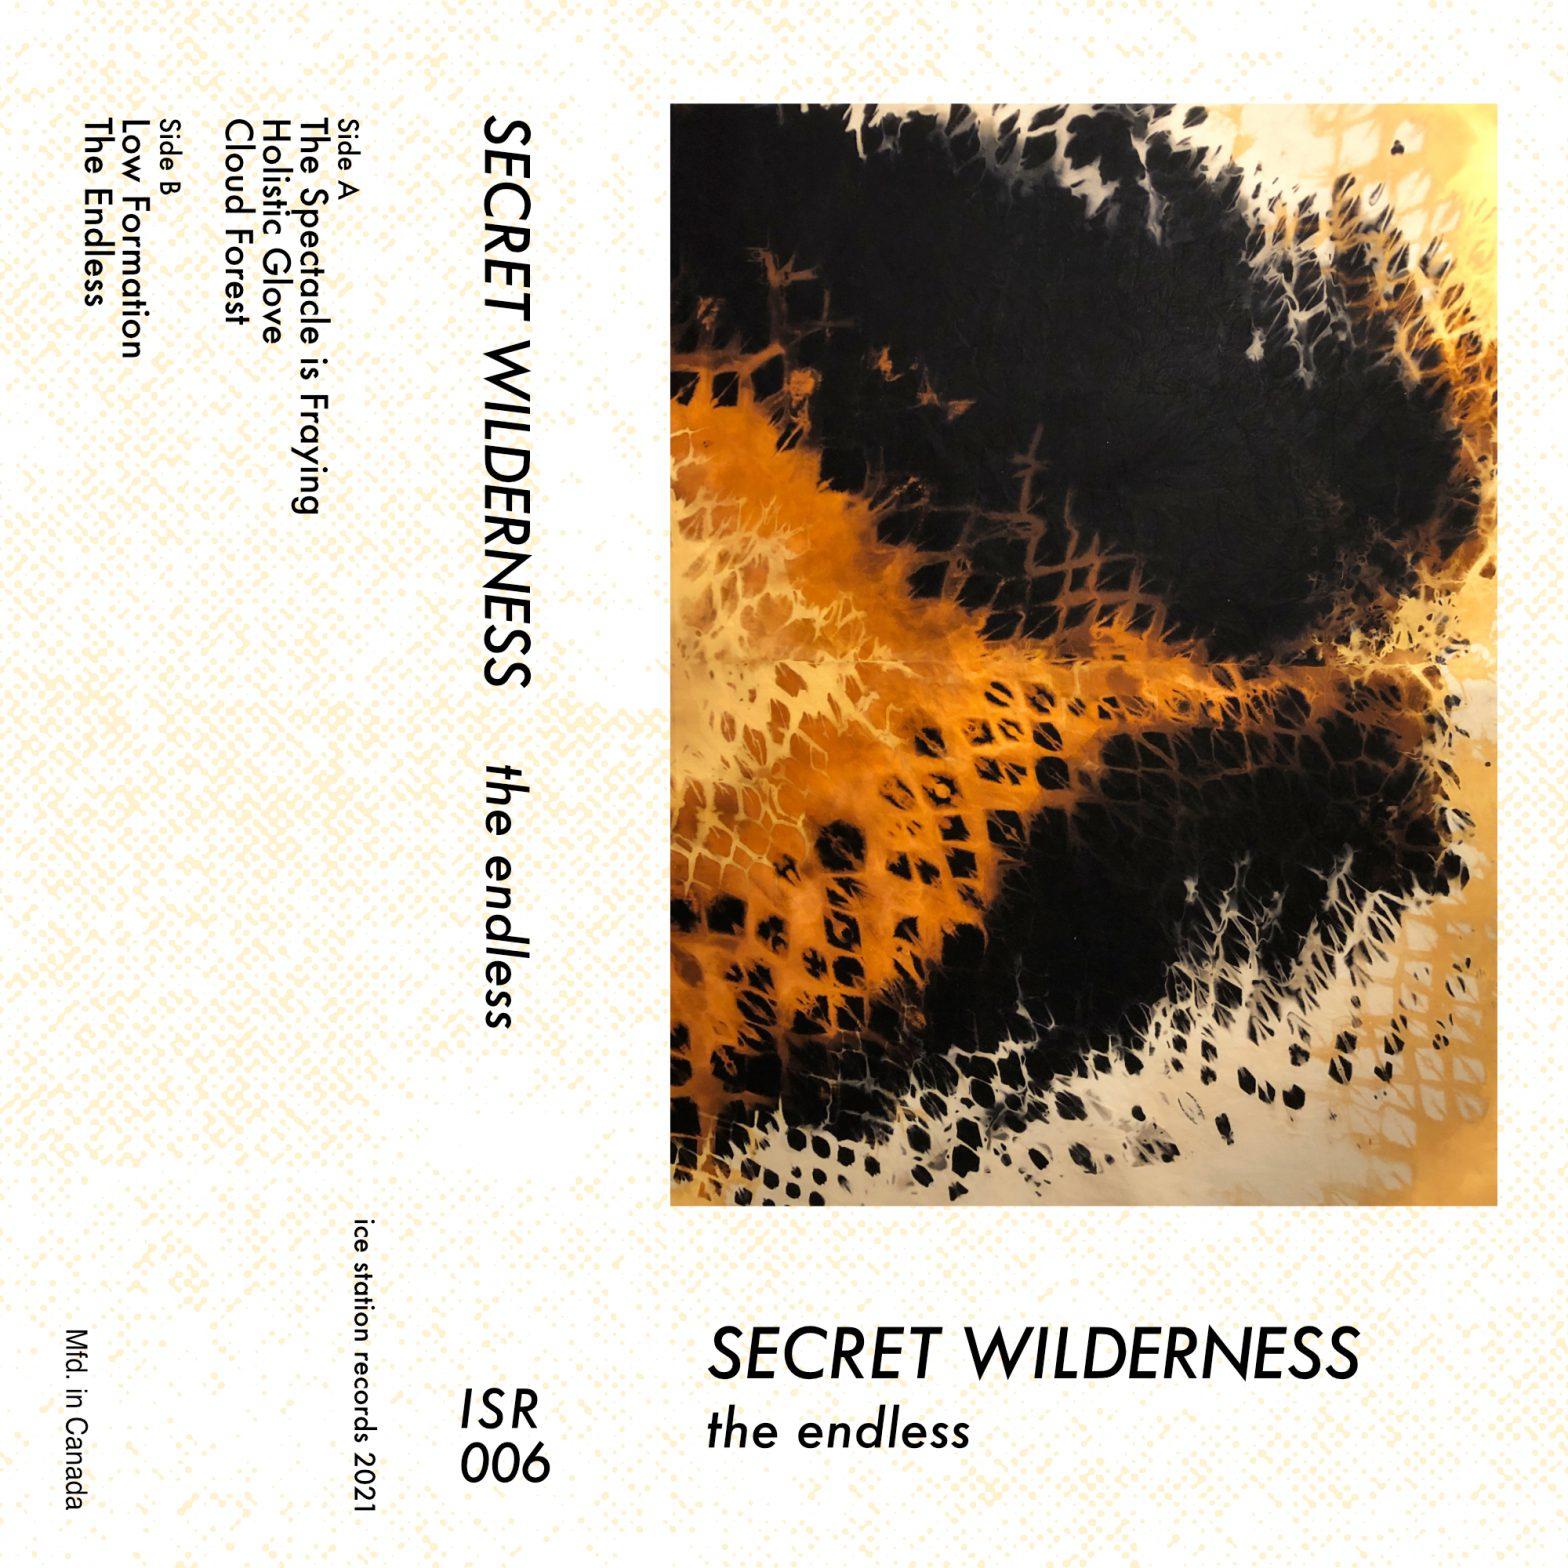 Secret Wildereness The Endless